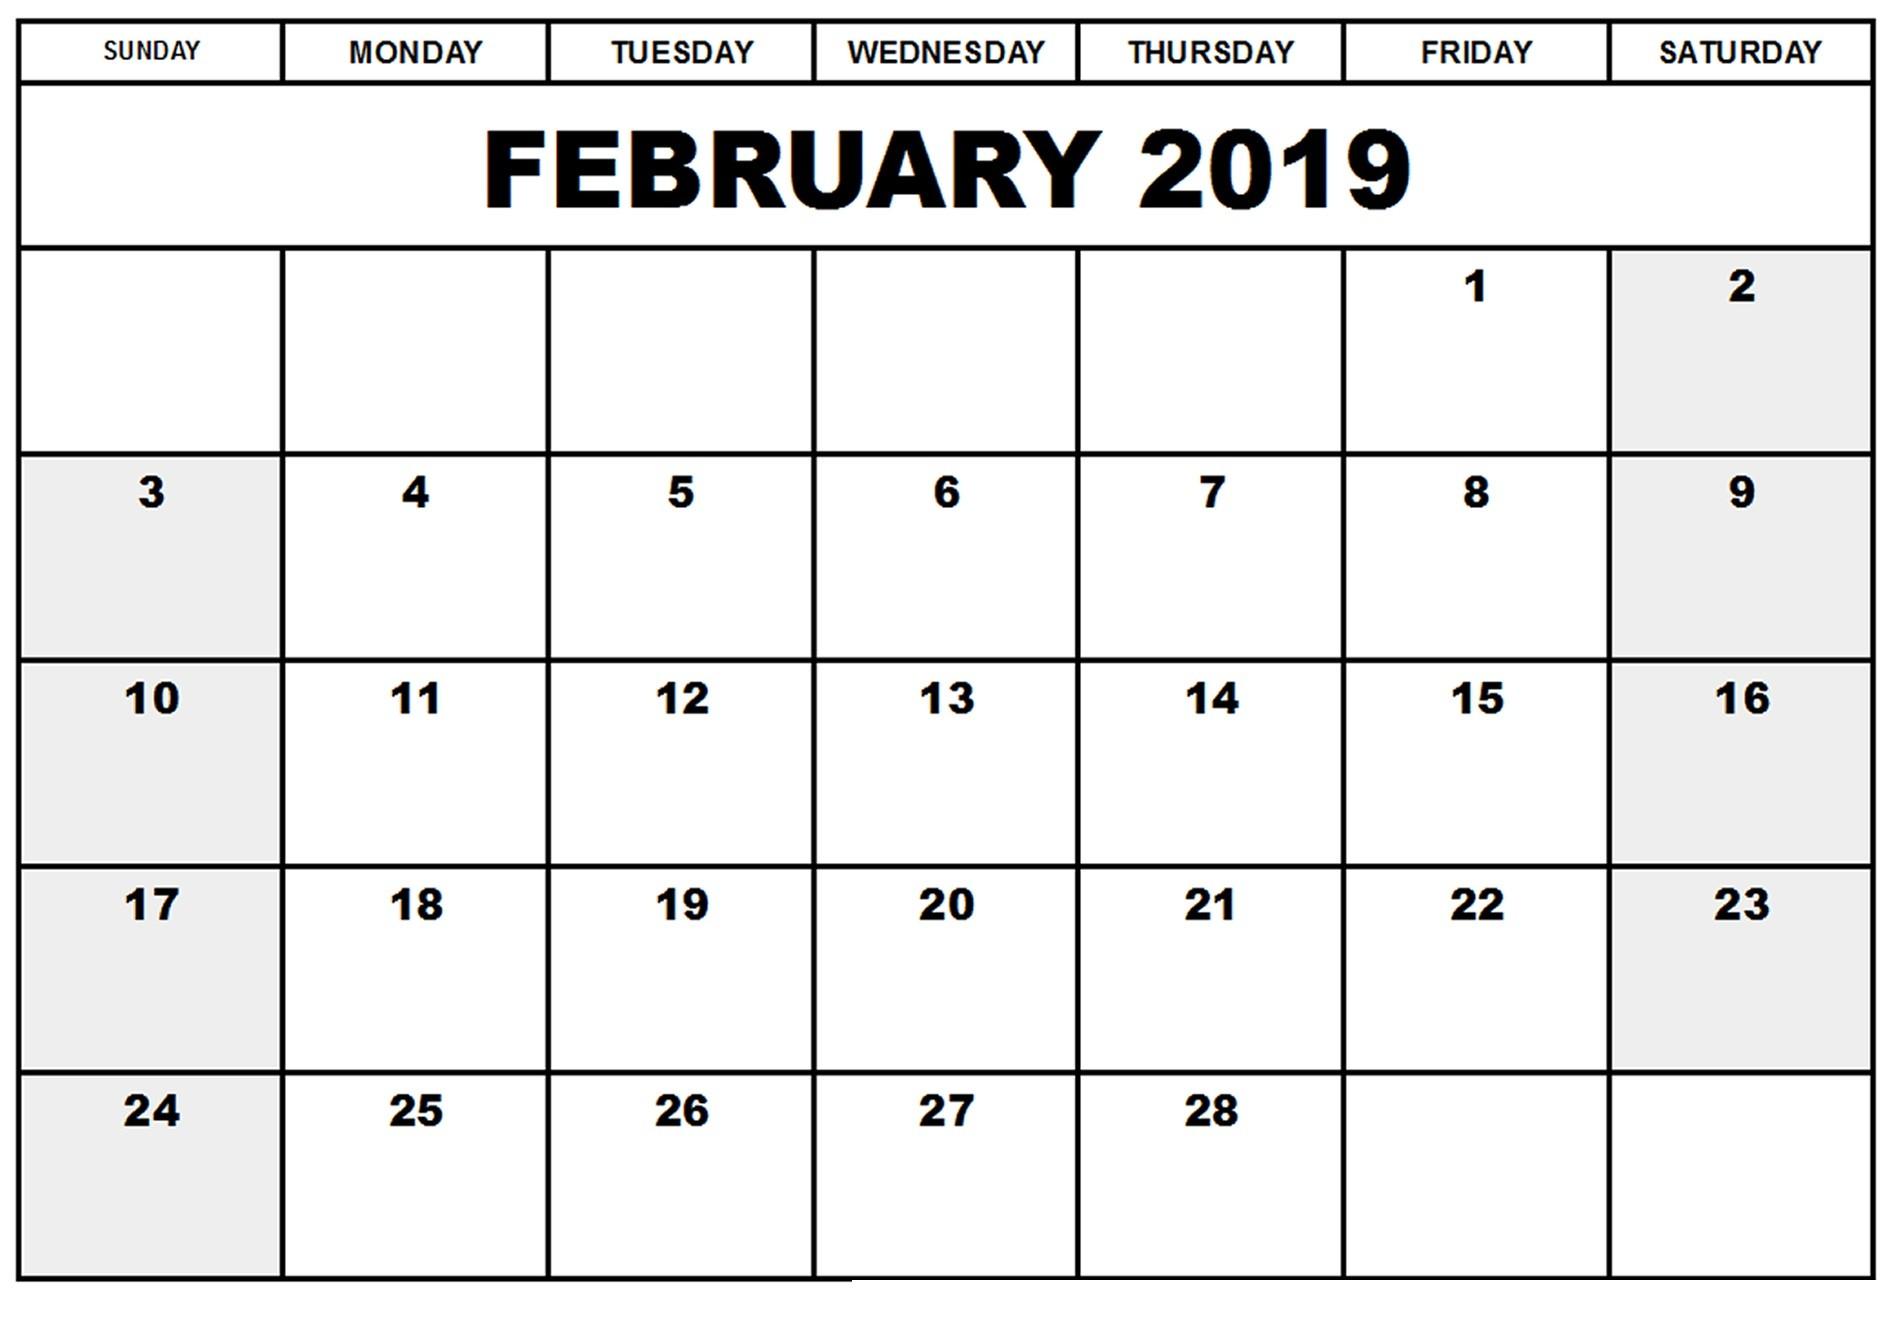 2019 Calendar Word Printable Free Blank A4 February 2019 Calendar Pdf Excel Word